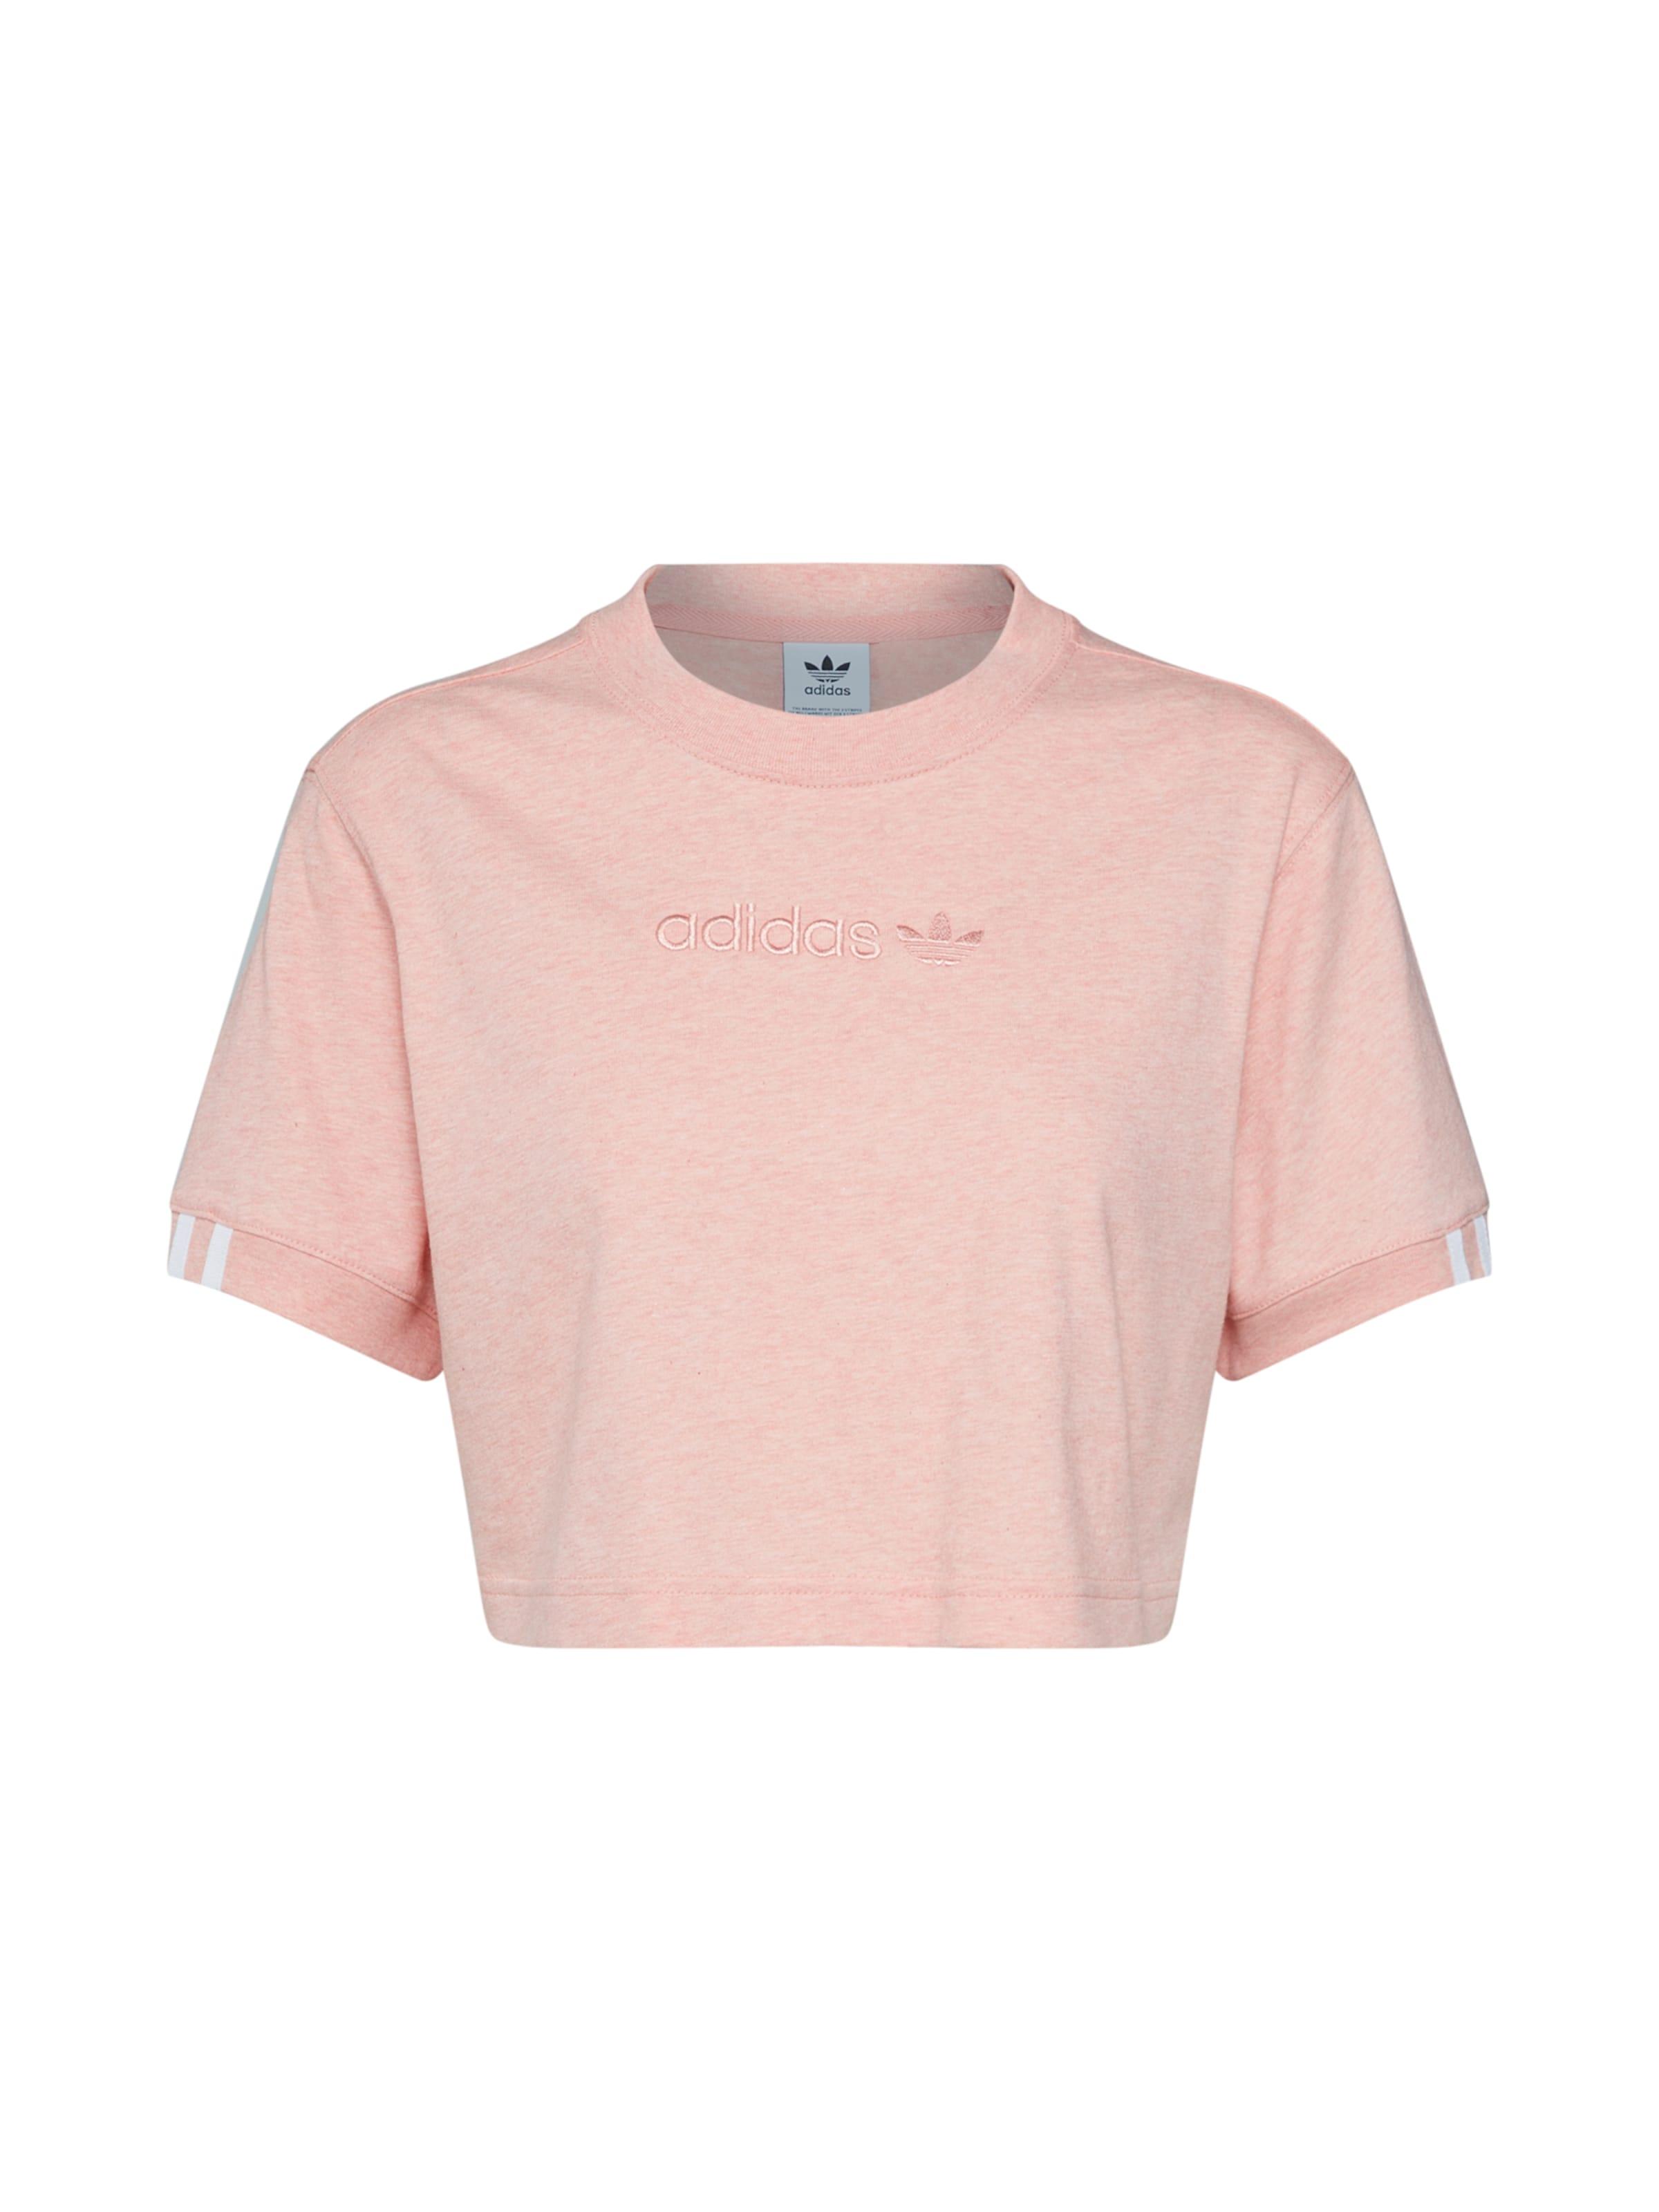 'coeeze' ClairBlanc Adidas En T shirt Originals Rose gb6Yf7y